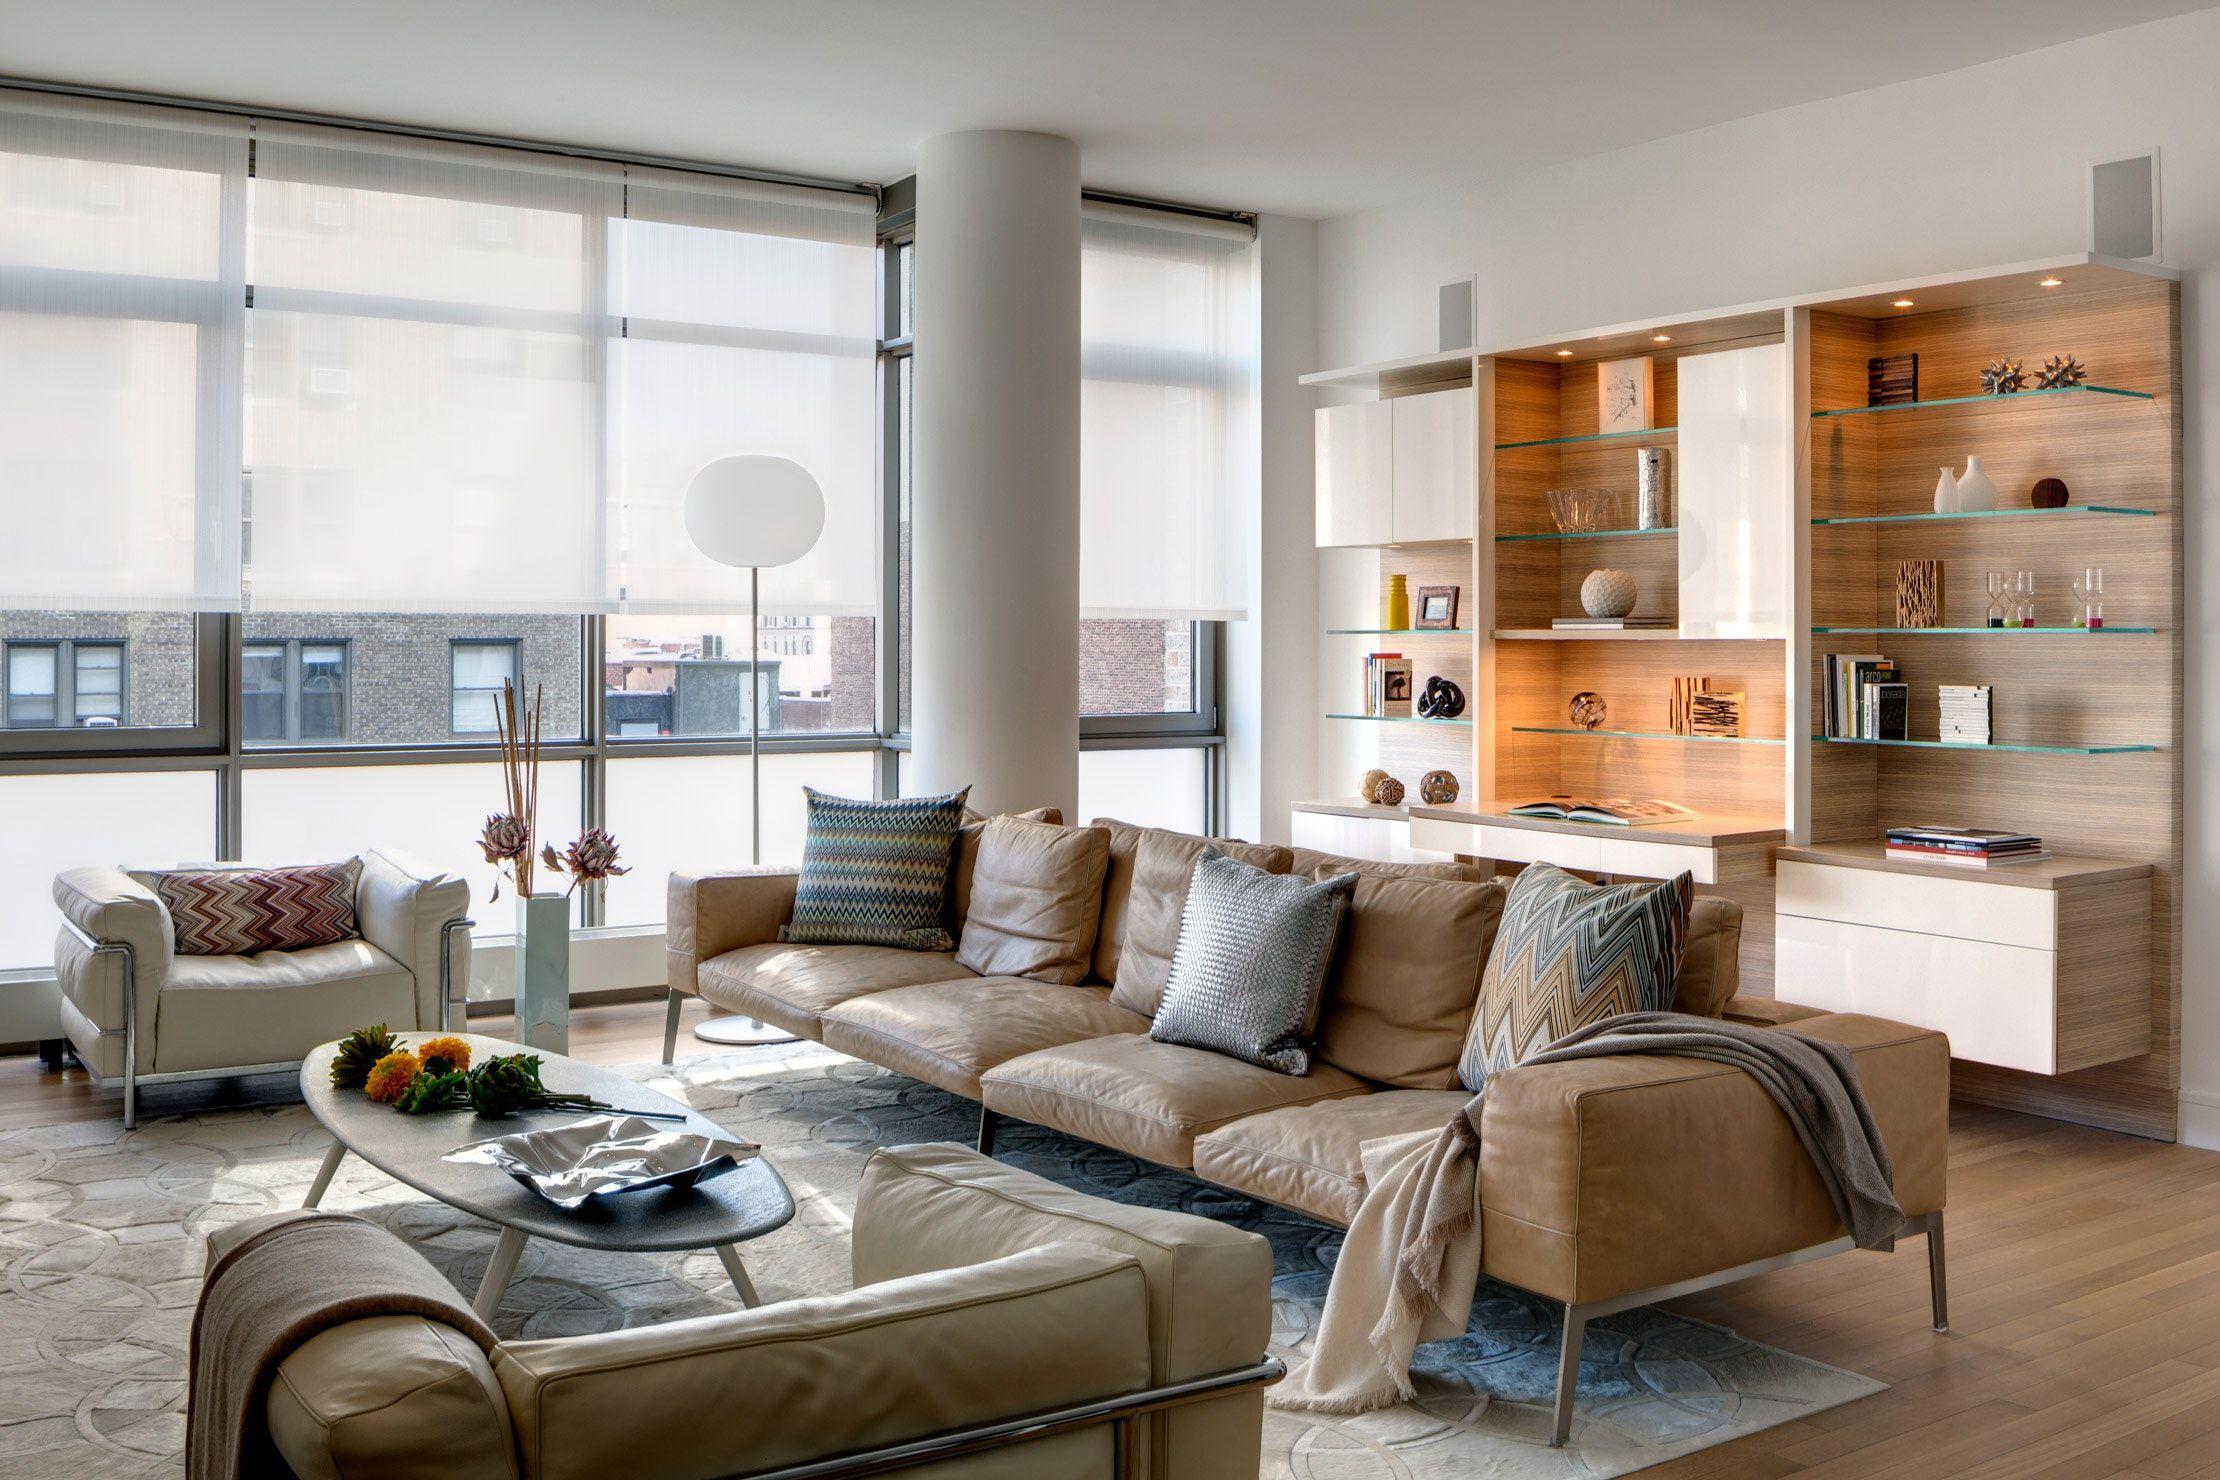 Modern Loft Full Flr Ws Nyc Gut Reno Interior Design Decor